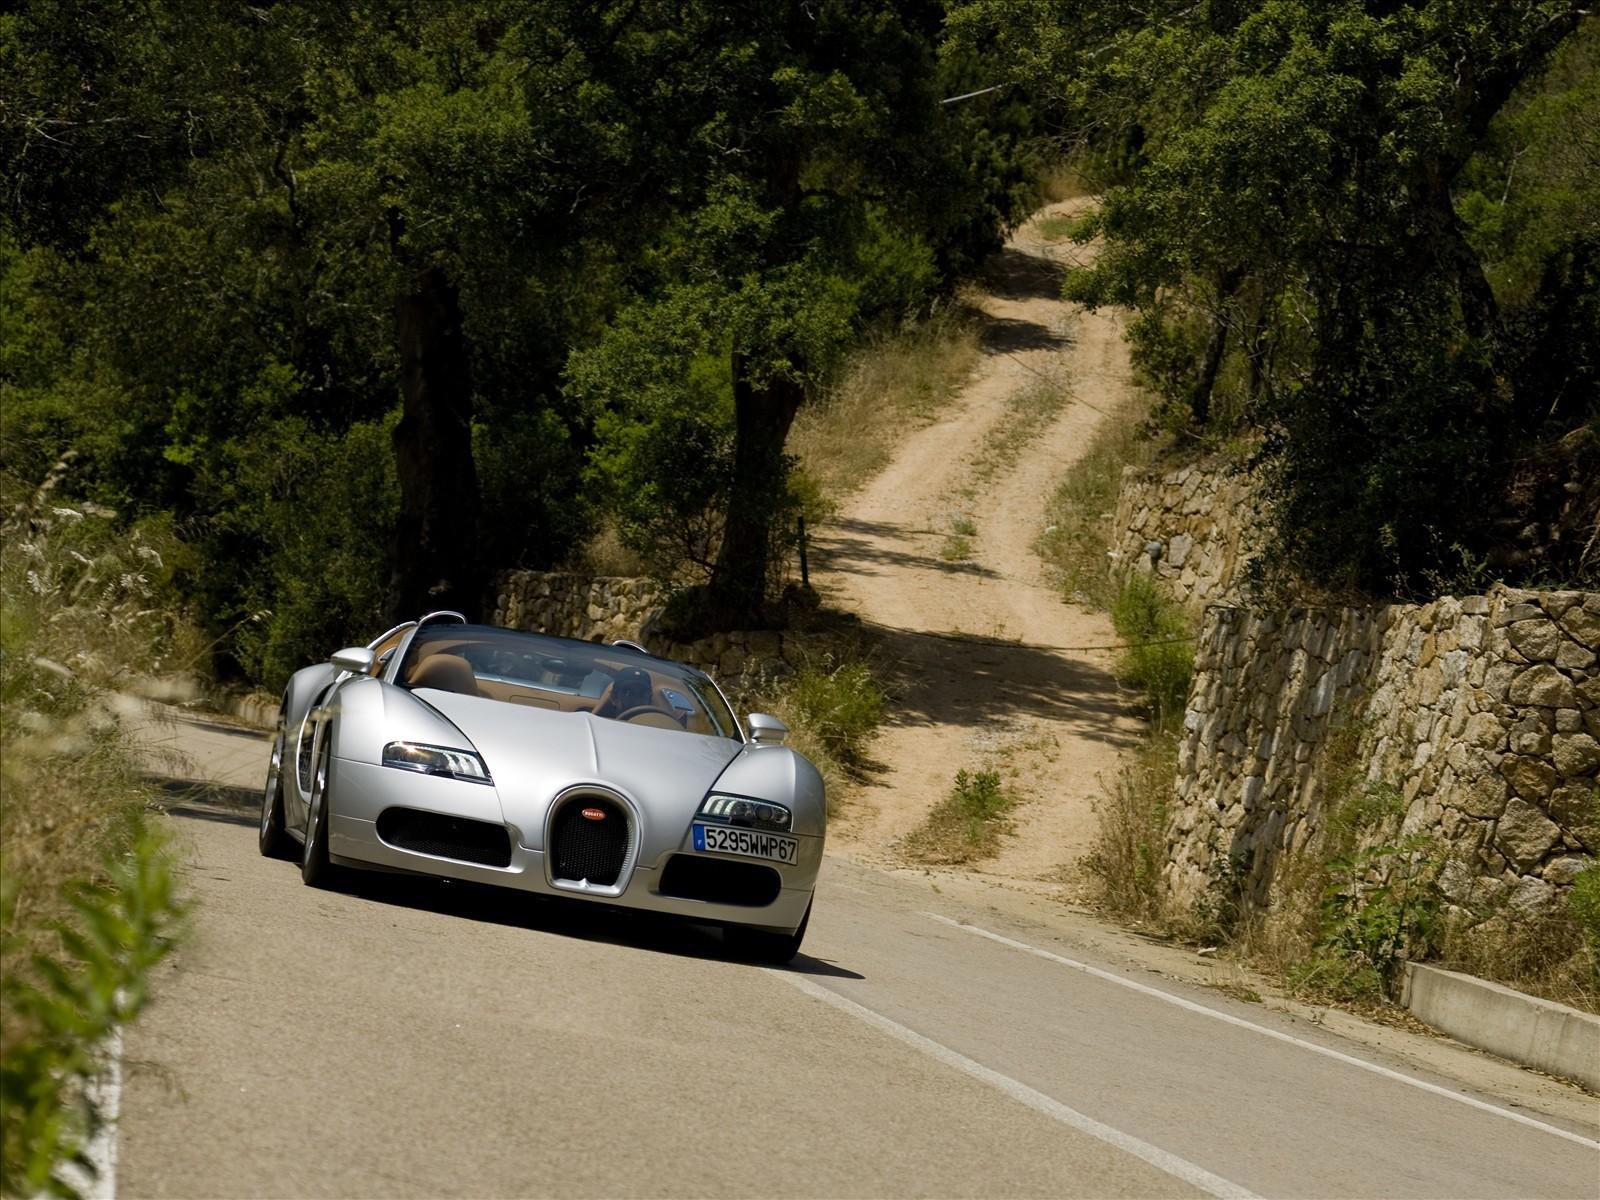 7432 скачать обои Транспорт, Машины, Дороги, Бугатти (Bugatti) - заставки и картинки бесплатно